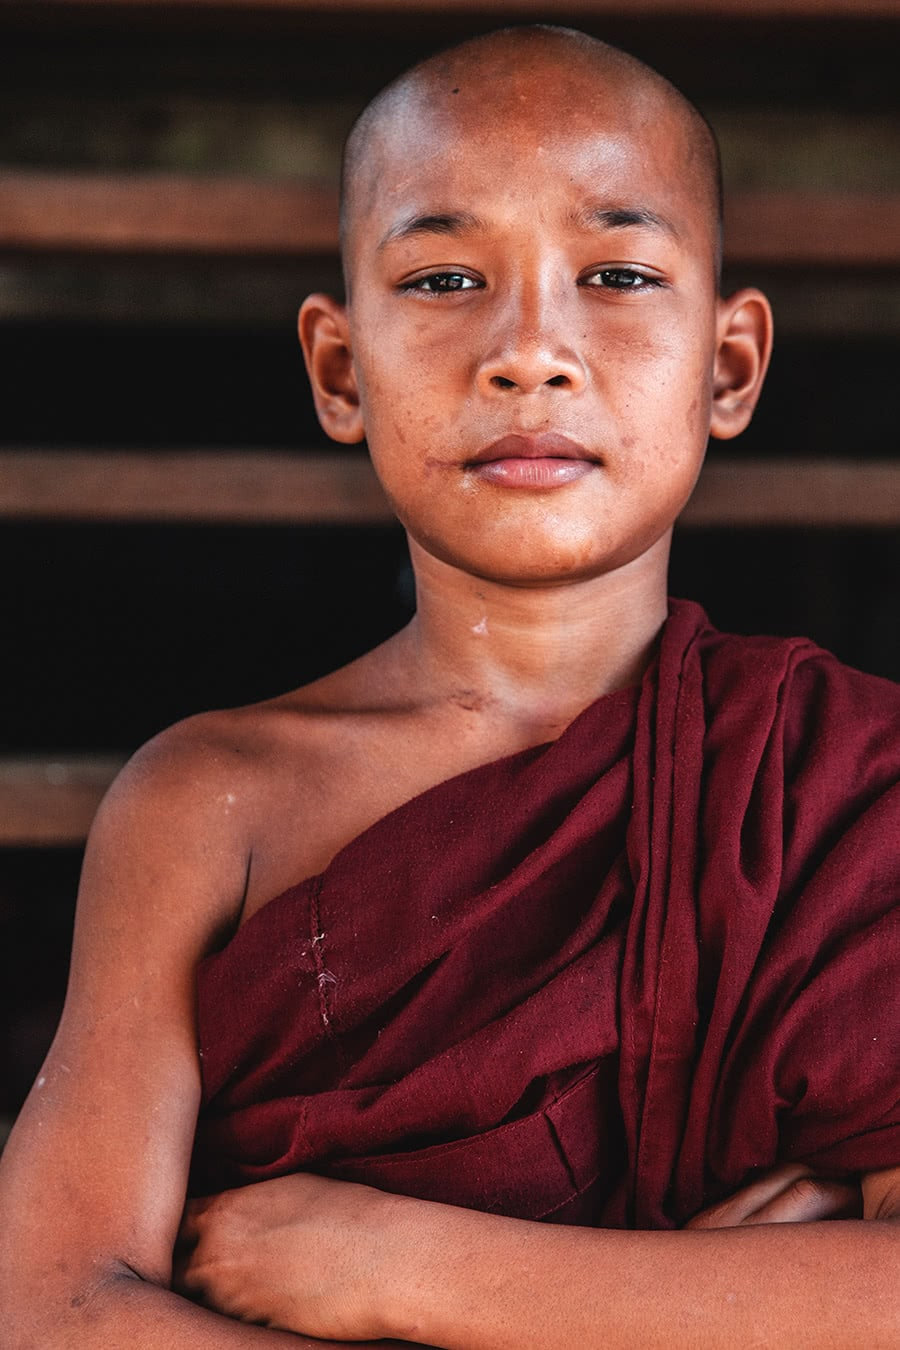 Novice monk on a remote island in the Mergui Archipelago, Myanmar.